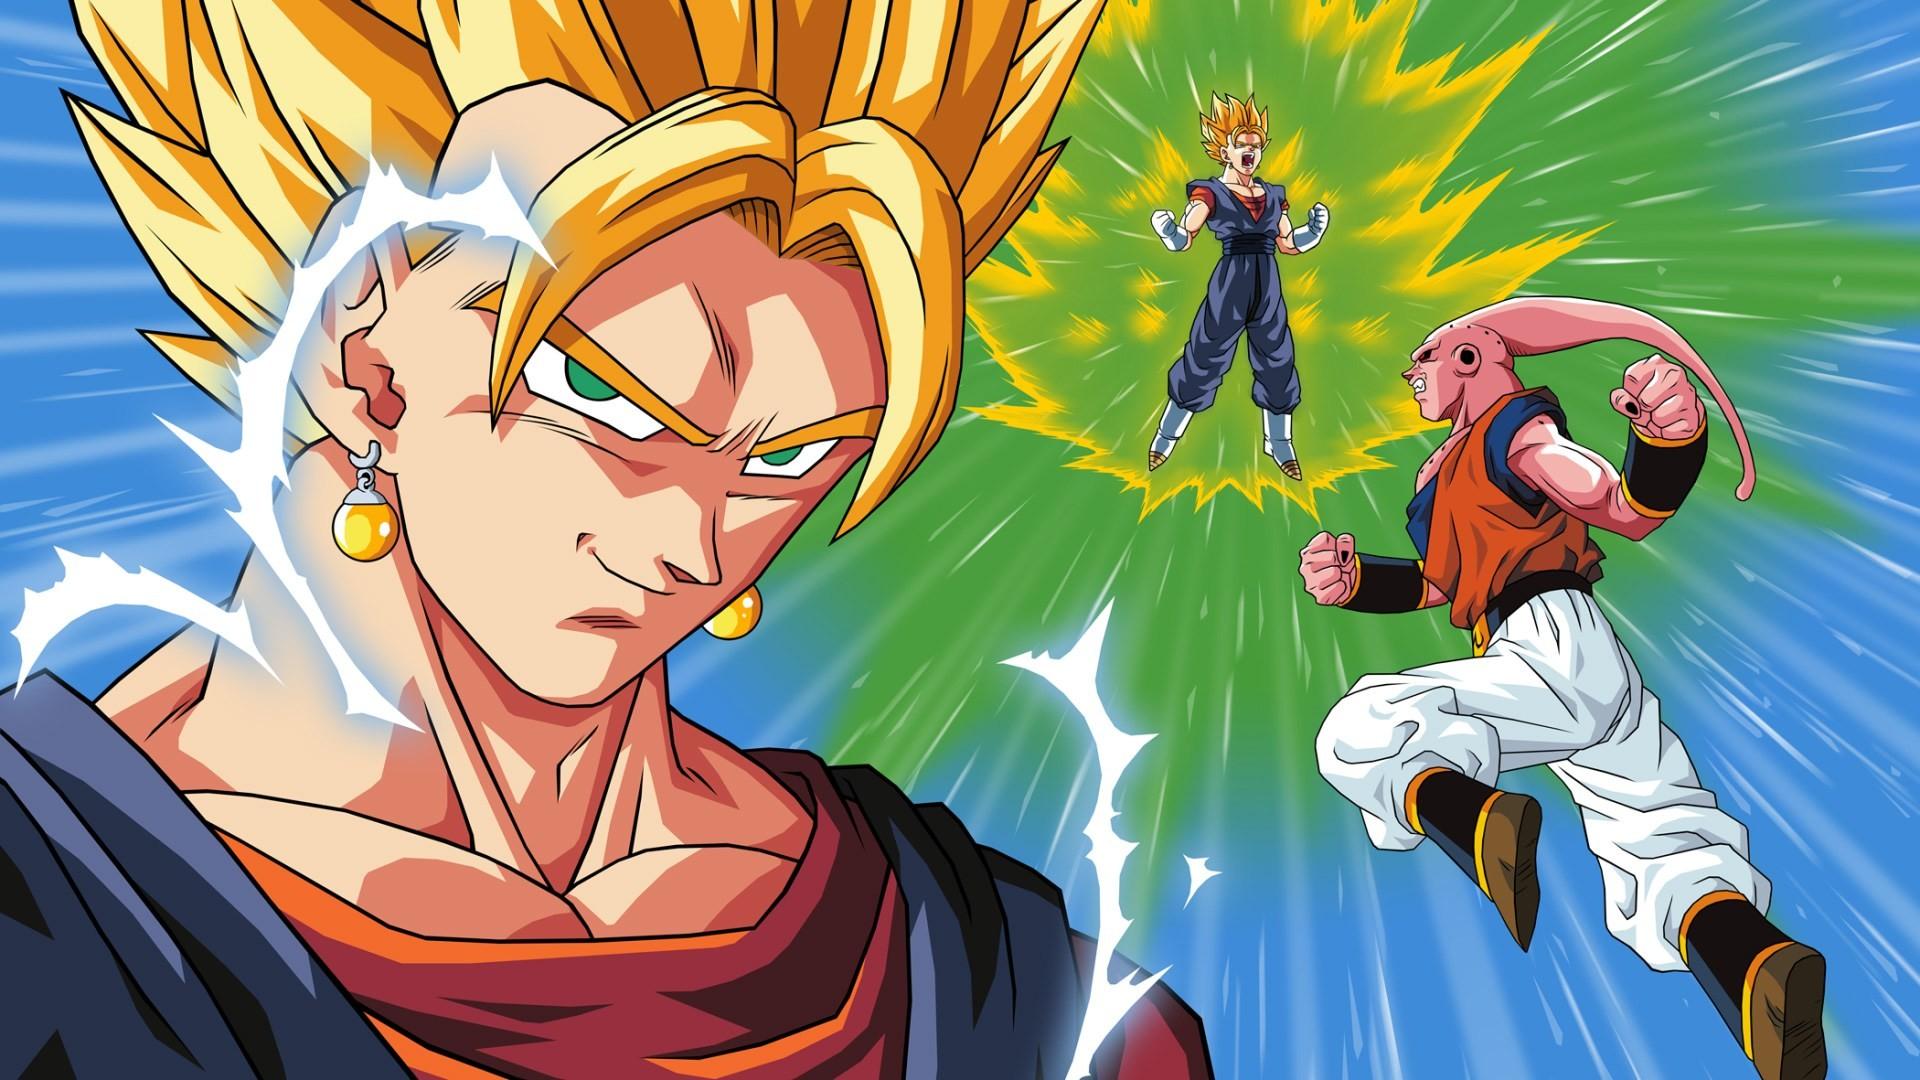 Vegito Dragon Ball Z Dragon Ball 1080p HD Wallpaper Background